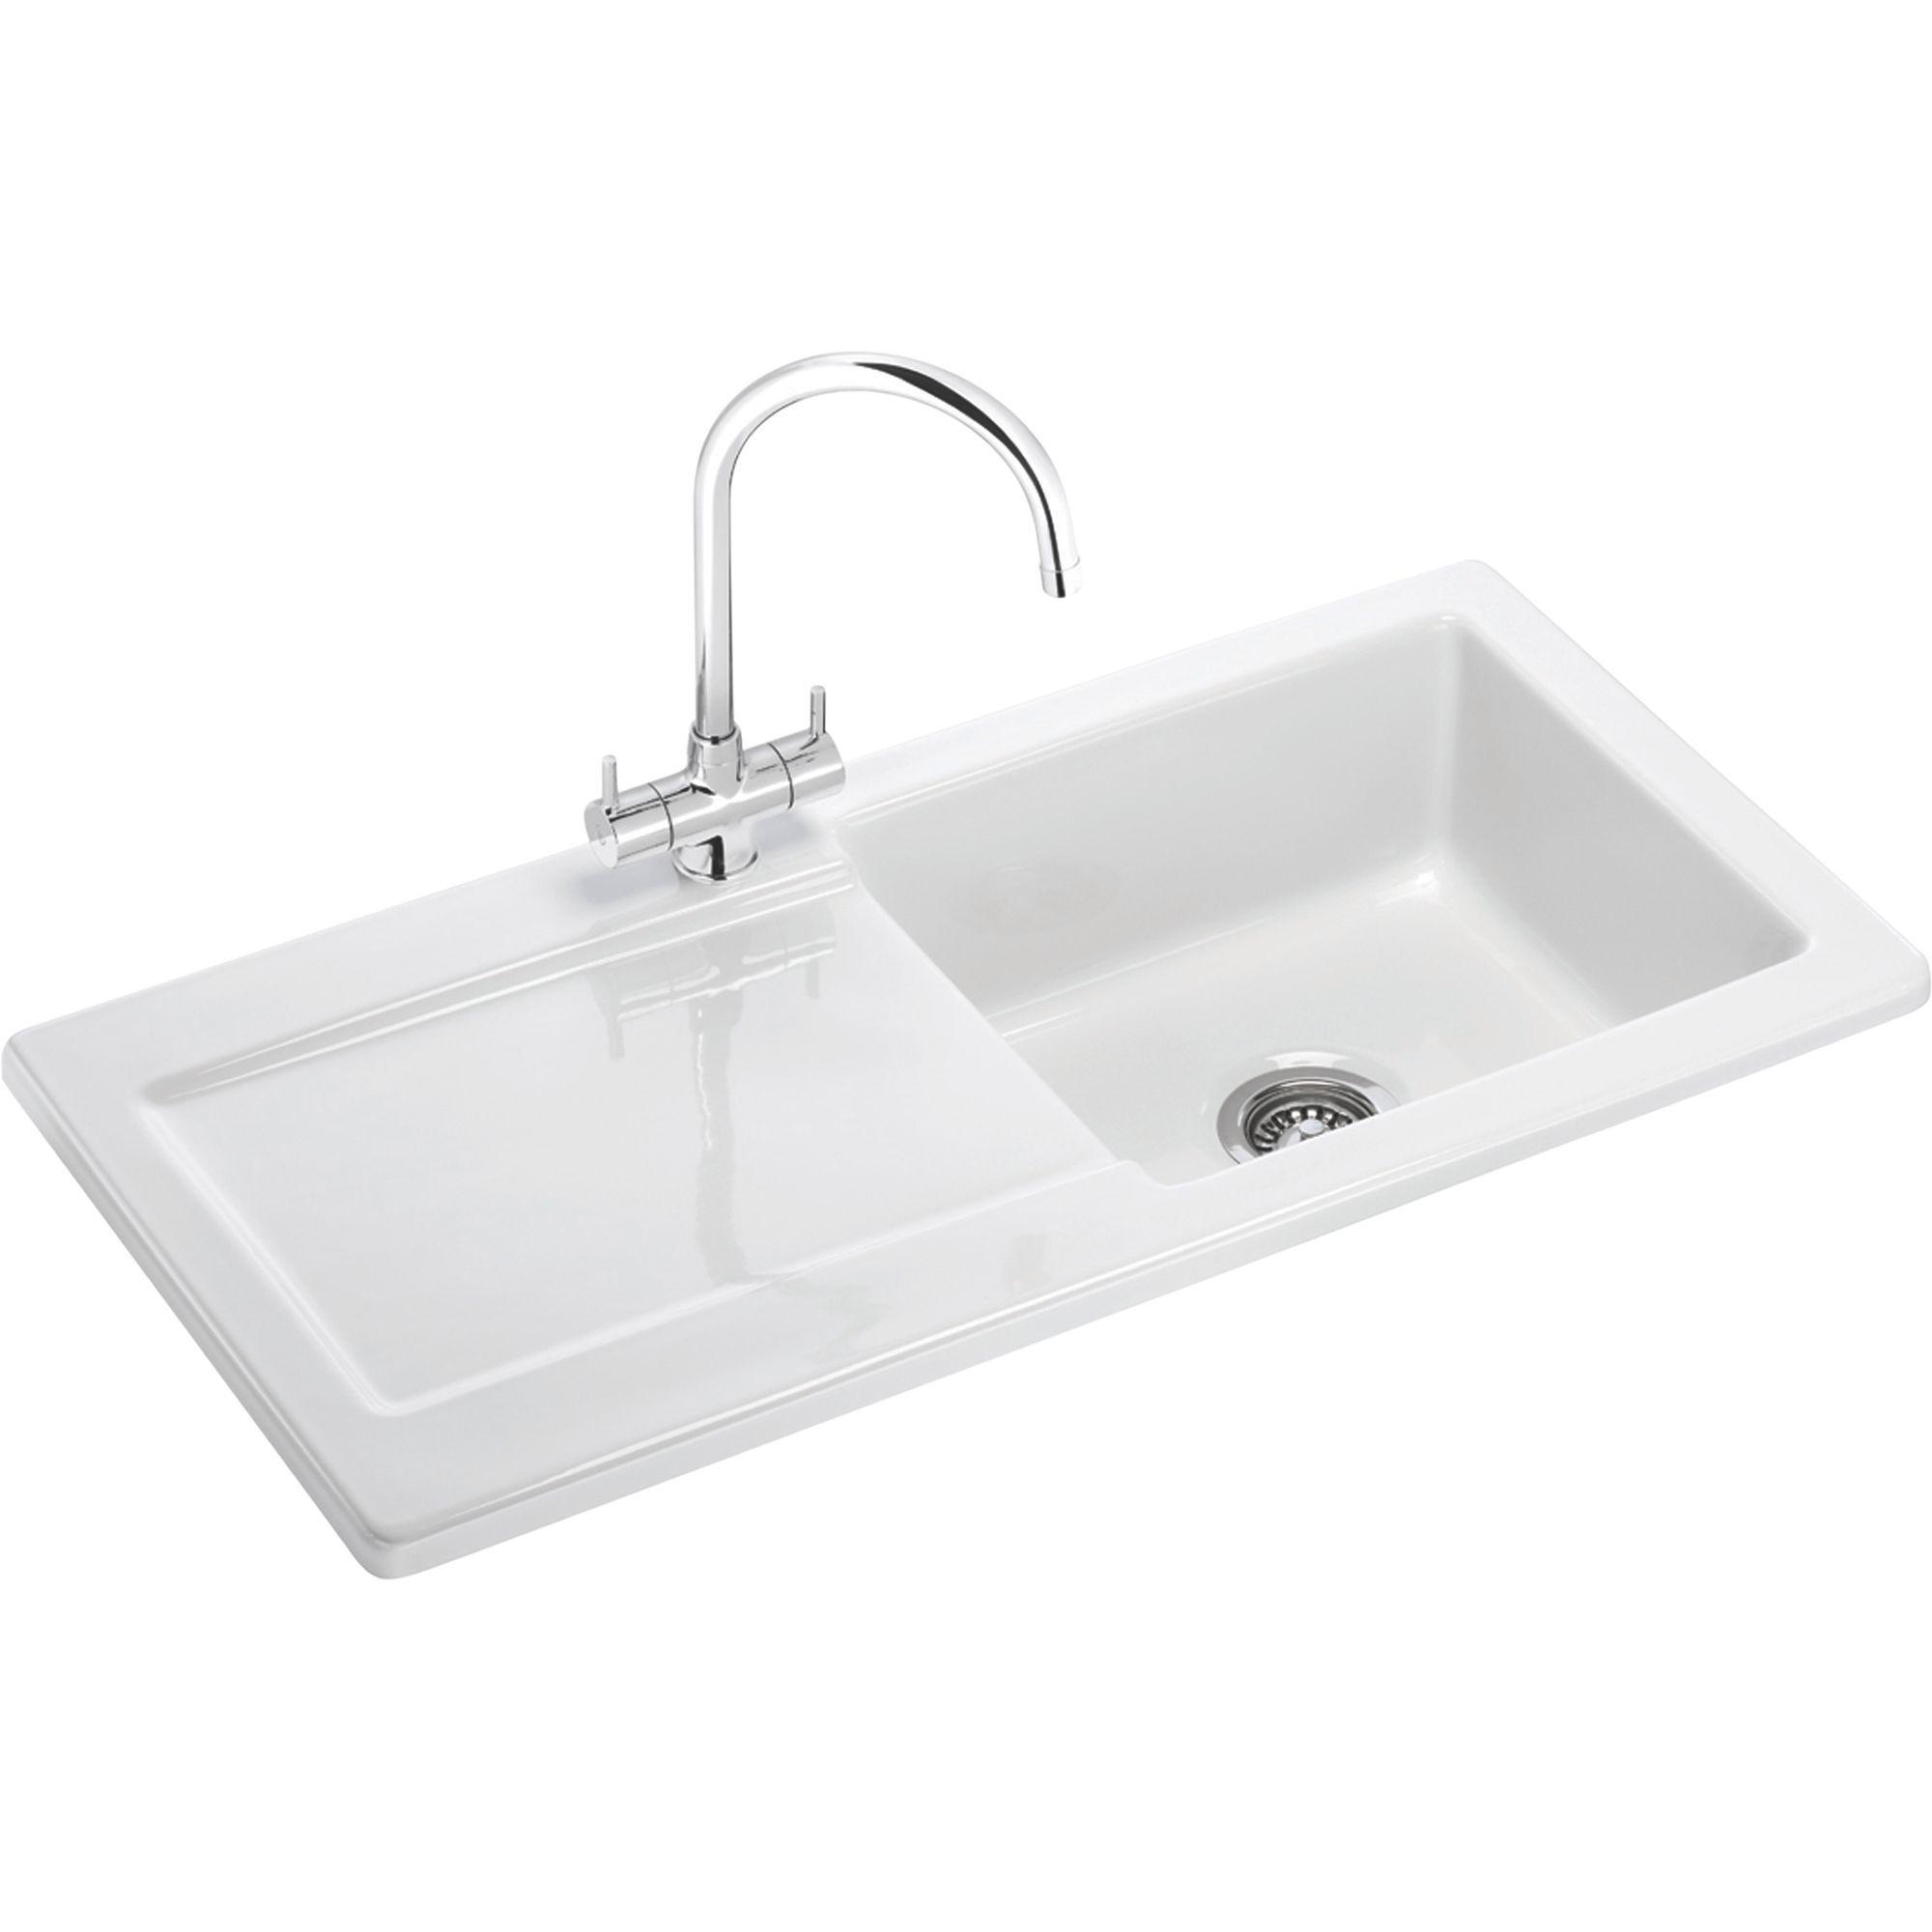 Franke Livorno 1 Bowl White Gloss Ceramic Kitchen Sink Departments Diy At B Q Sinks